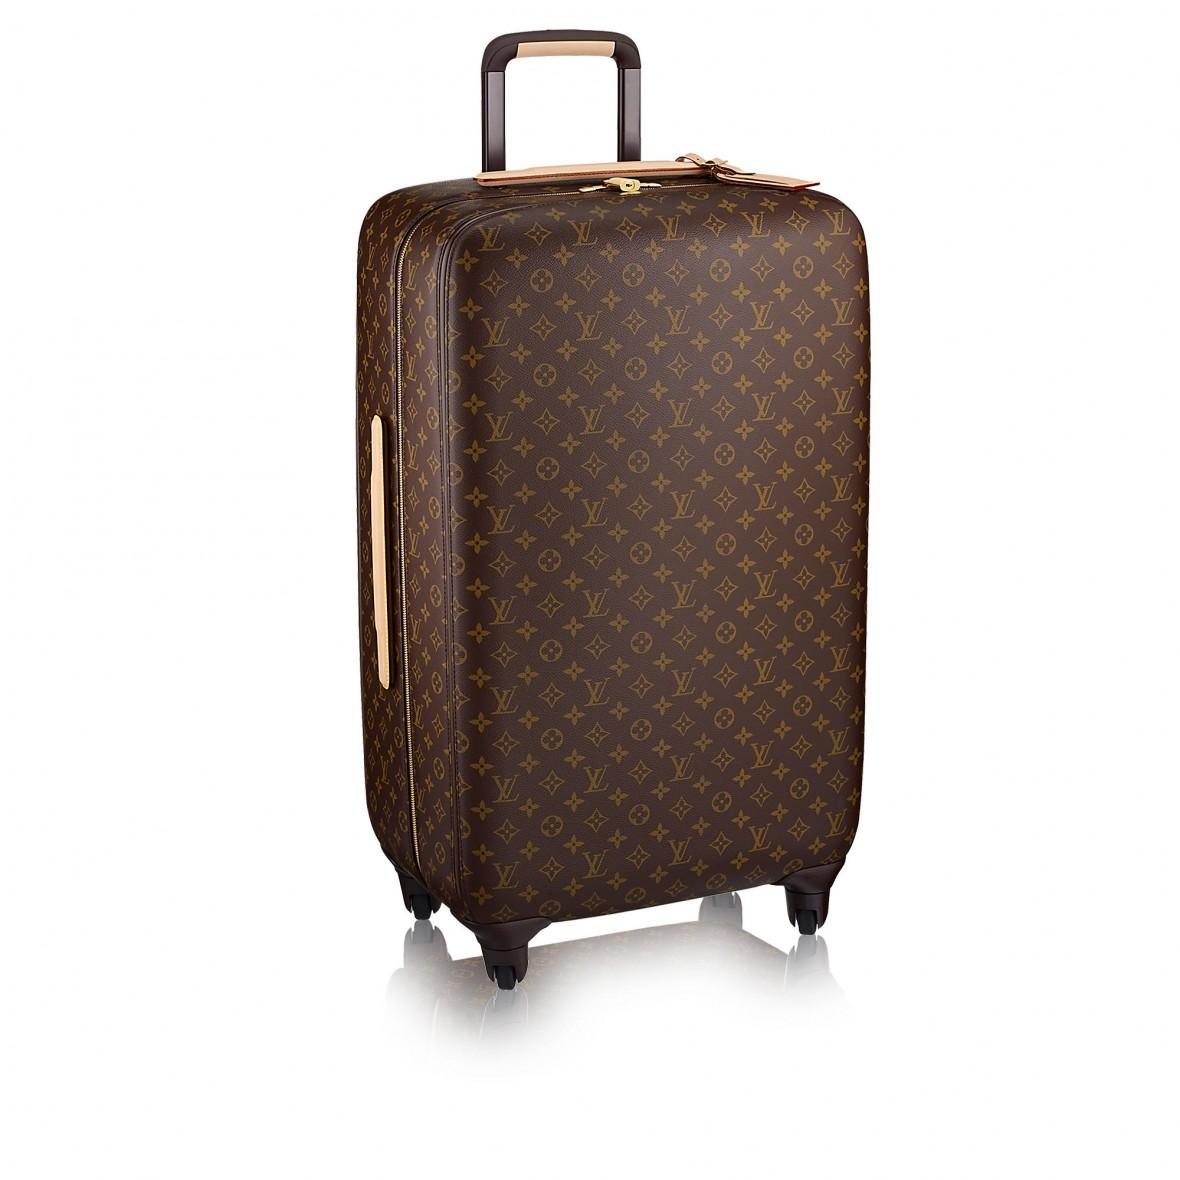 Luis vuitton koffer